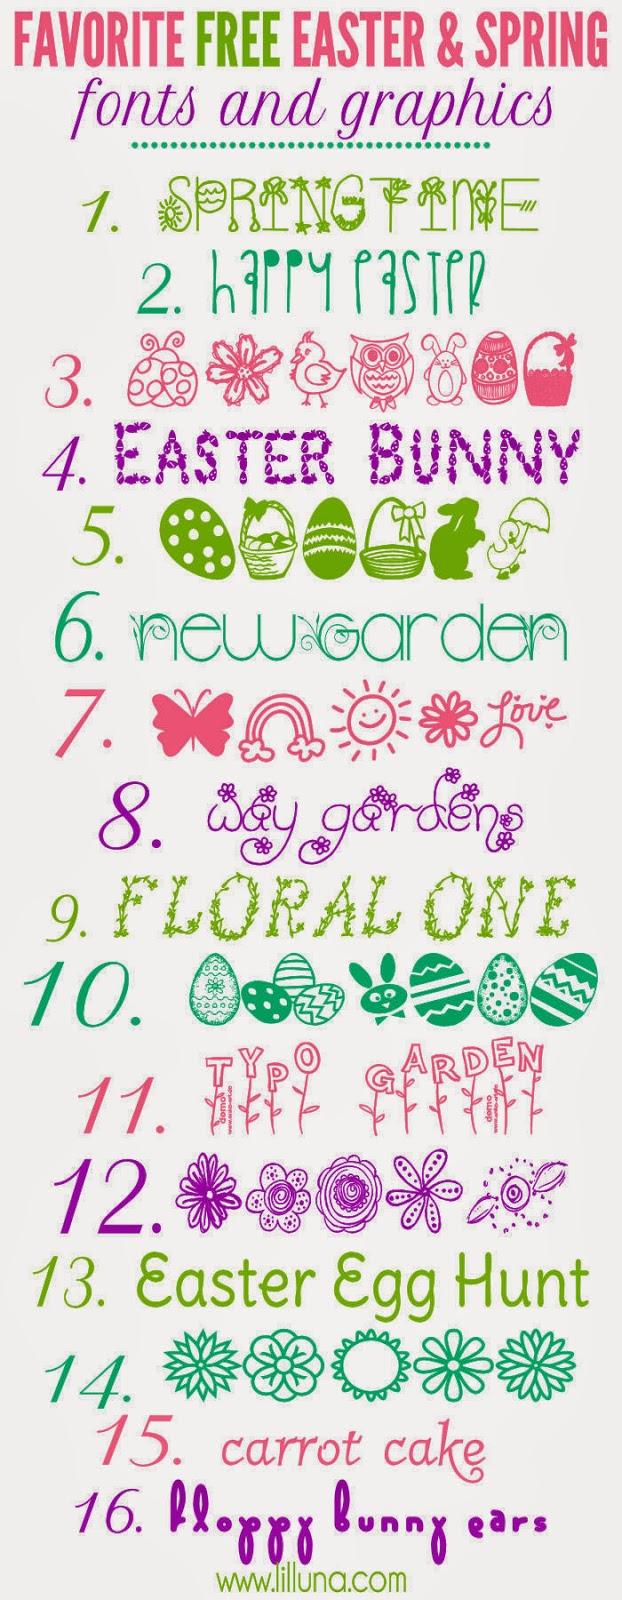 http://lilluna.com/free-easter-spring-fonts/